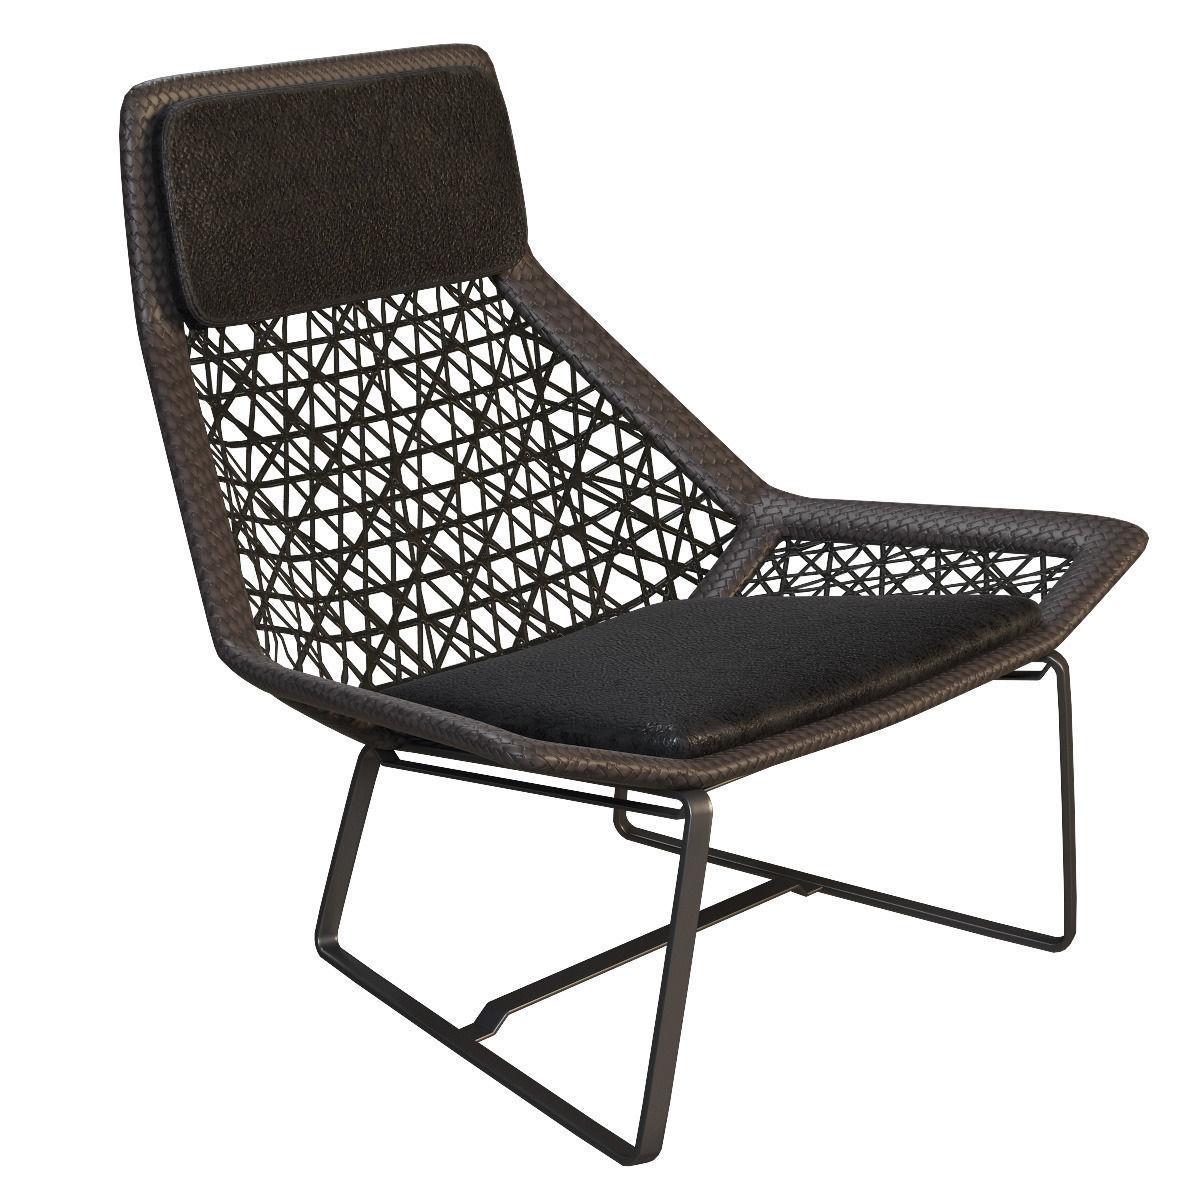 Etonnant Outdoor Wicker Chair Maia Of Kettal 3d Model Max Obj 3ds Fbx Mtl 1 ...